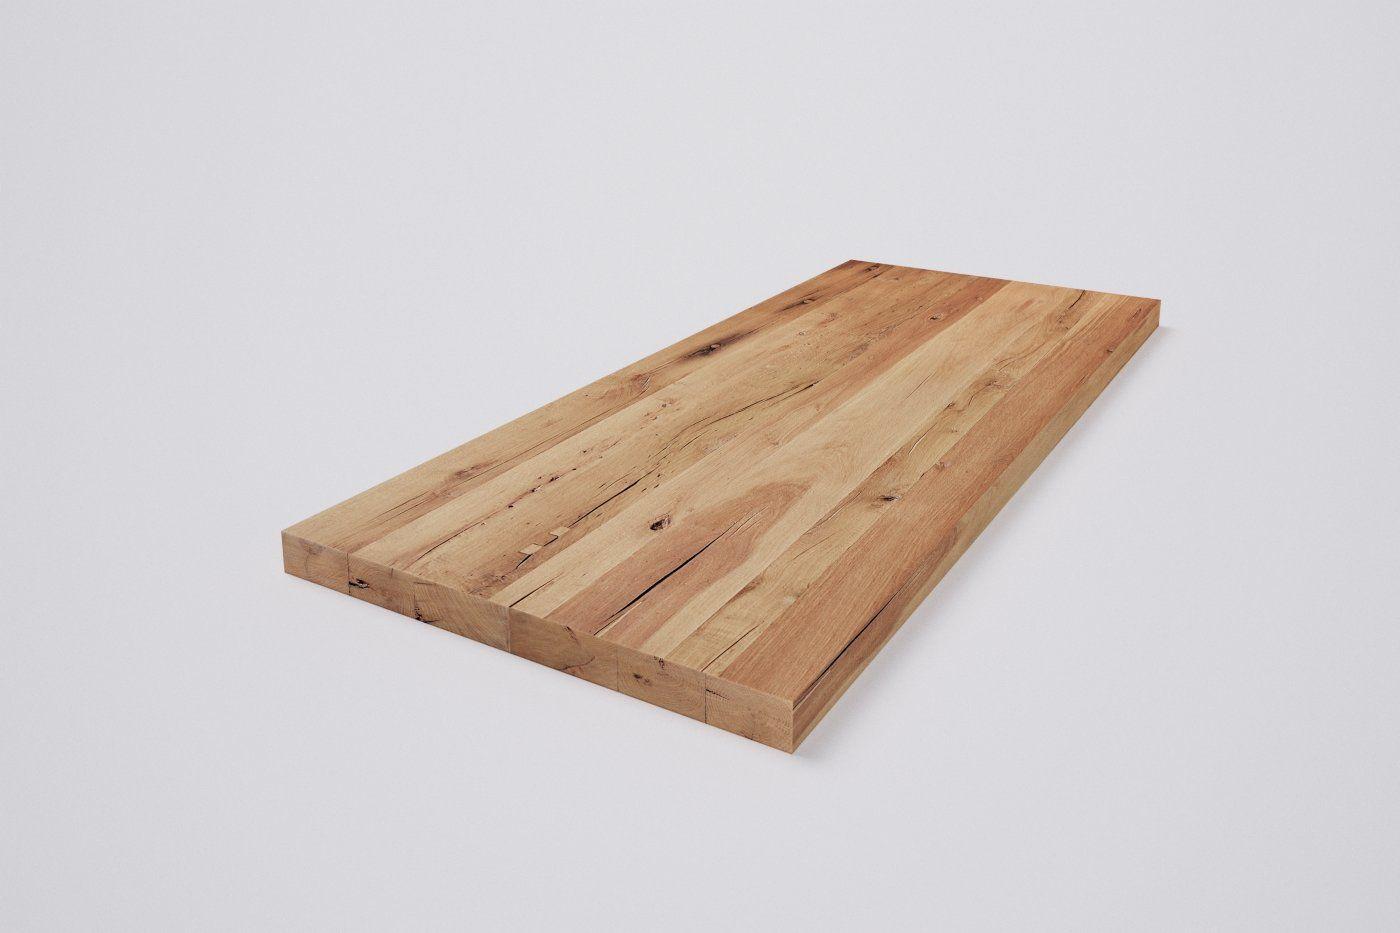 Massivholz Tischplatte Wohnsektion Massivholz Tischplatte Tischplatten Tisch